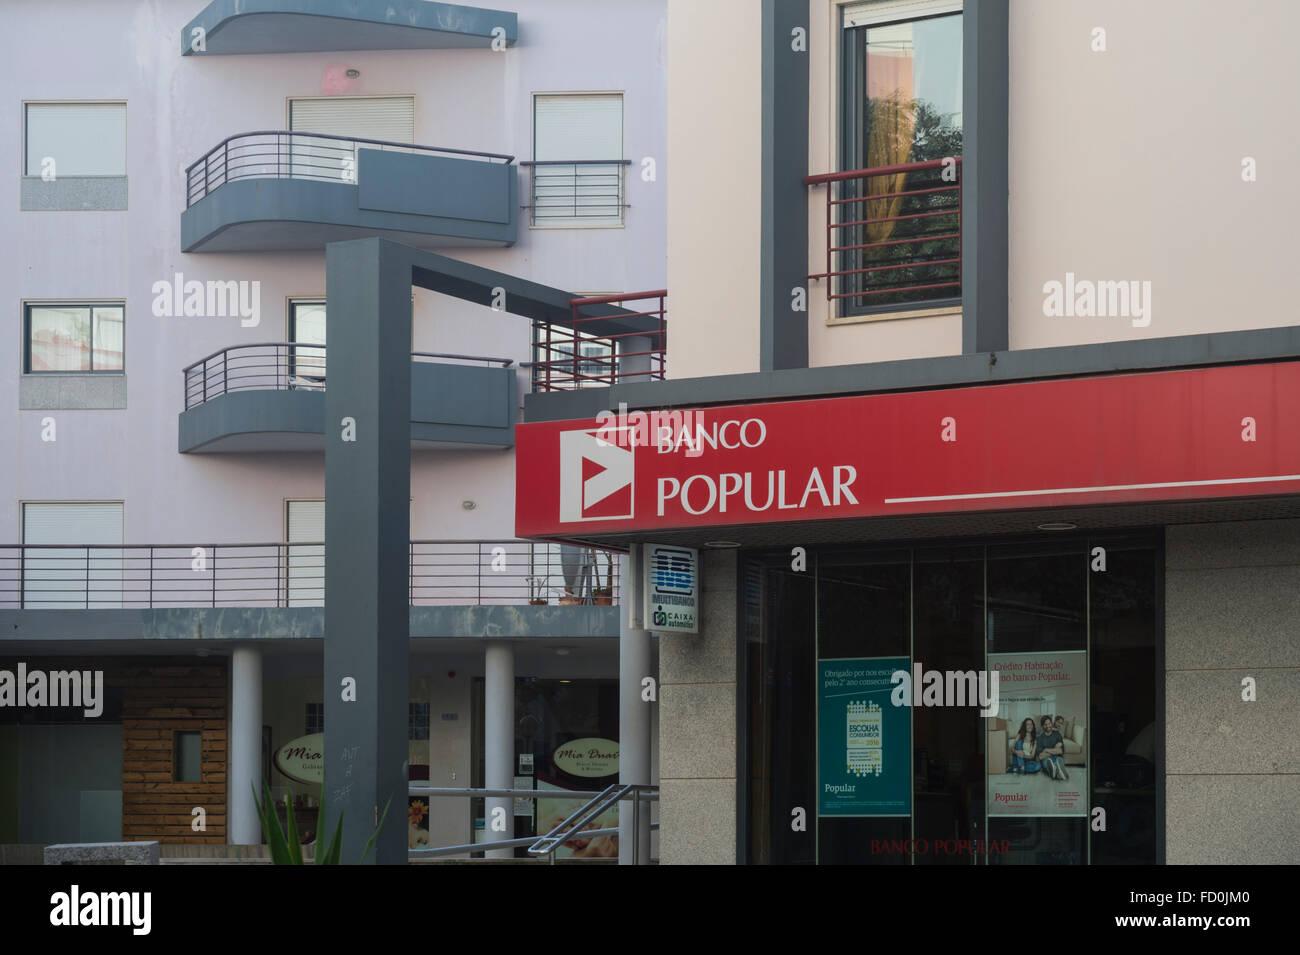 Branch of Banco Popular in Portugal, EU. - Stock Image